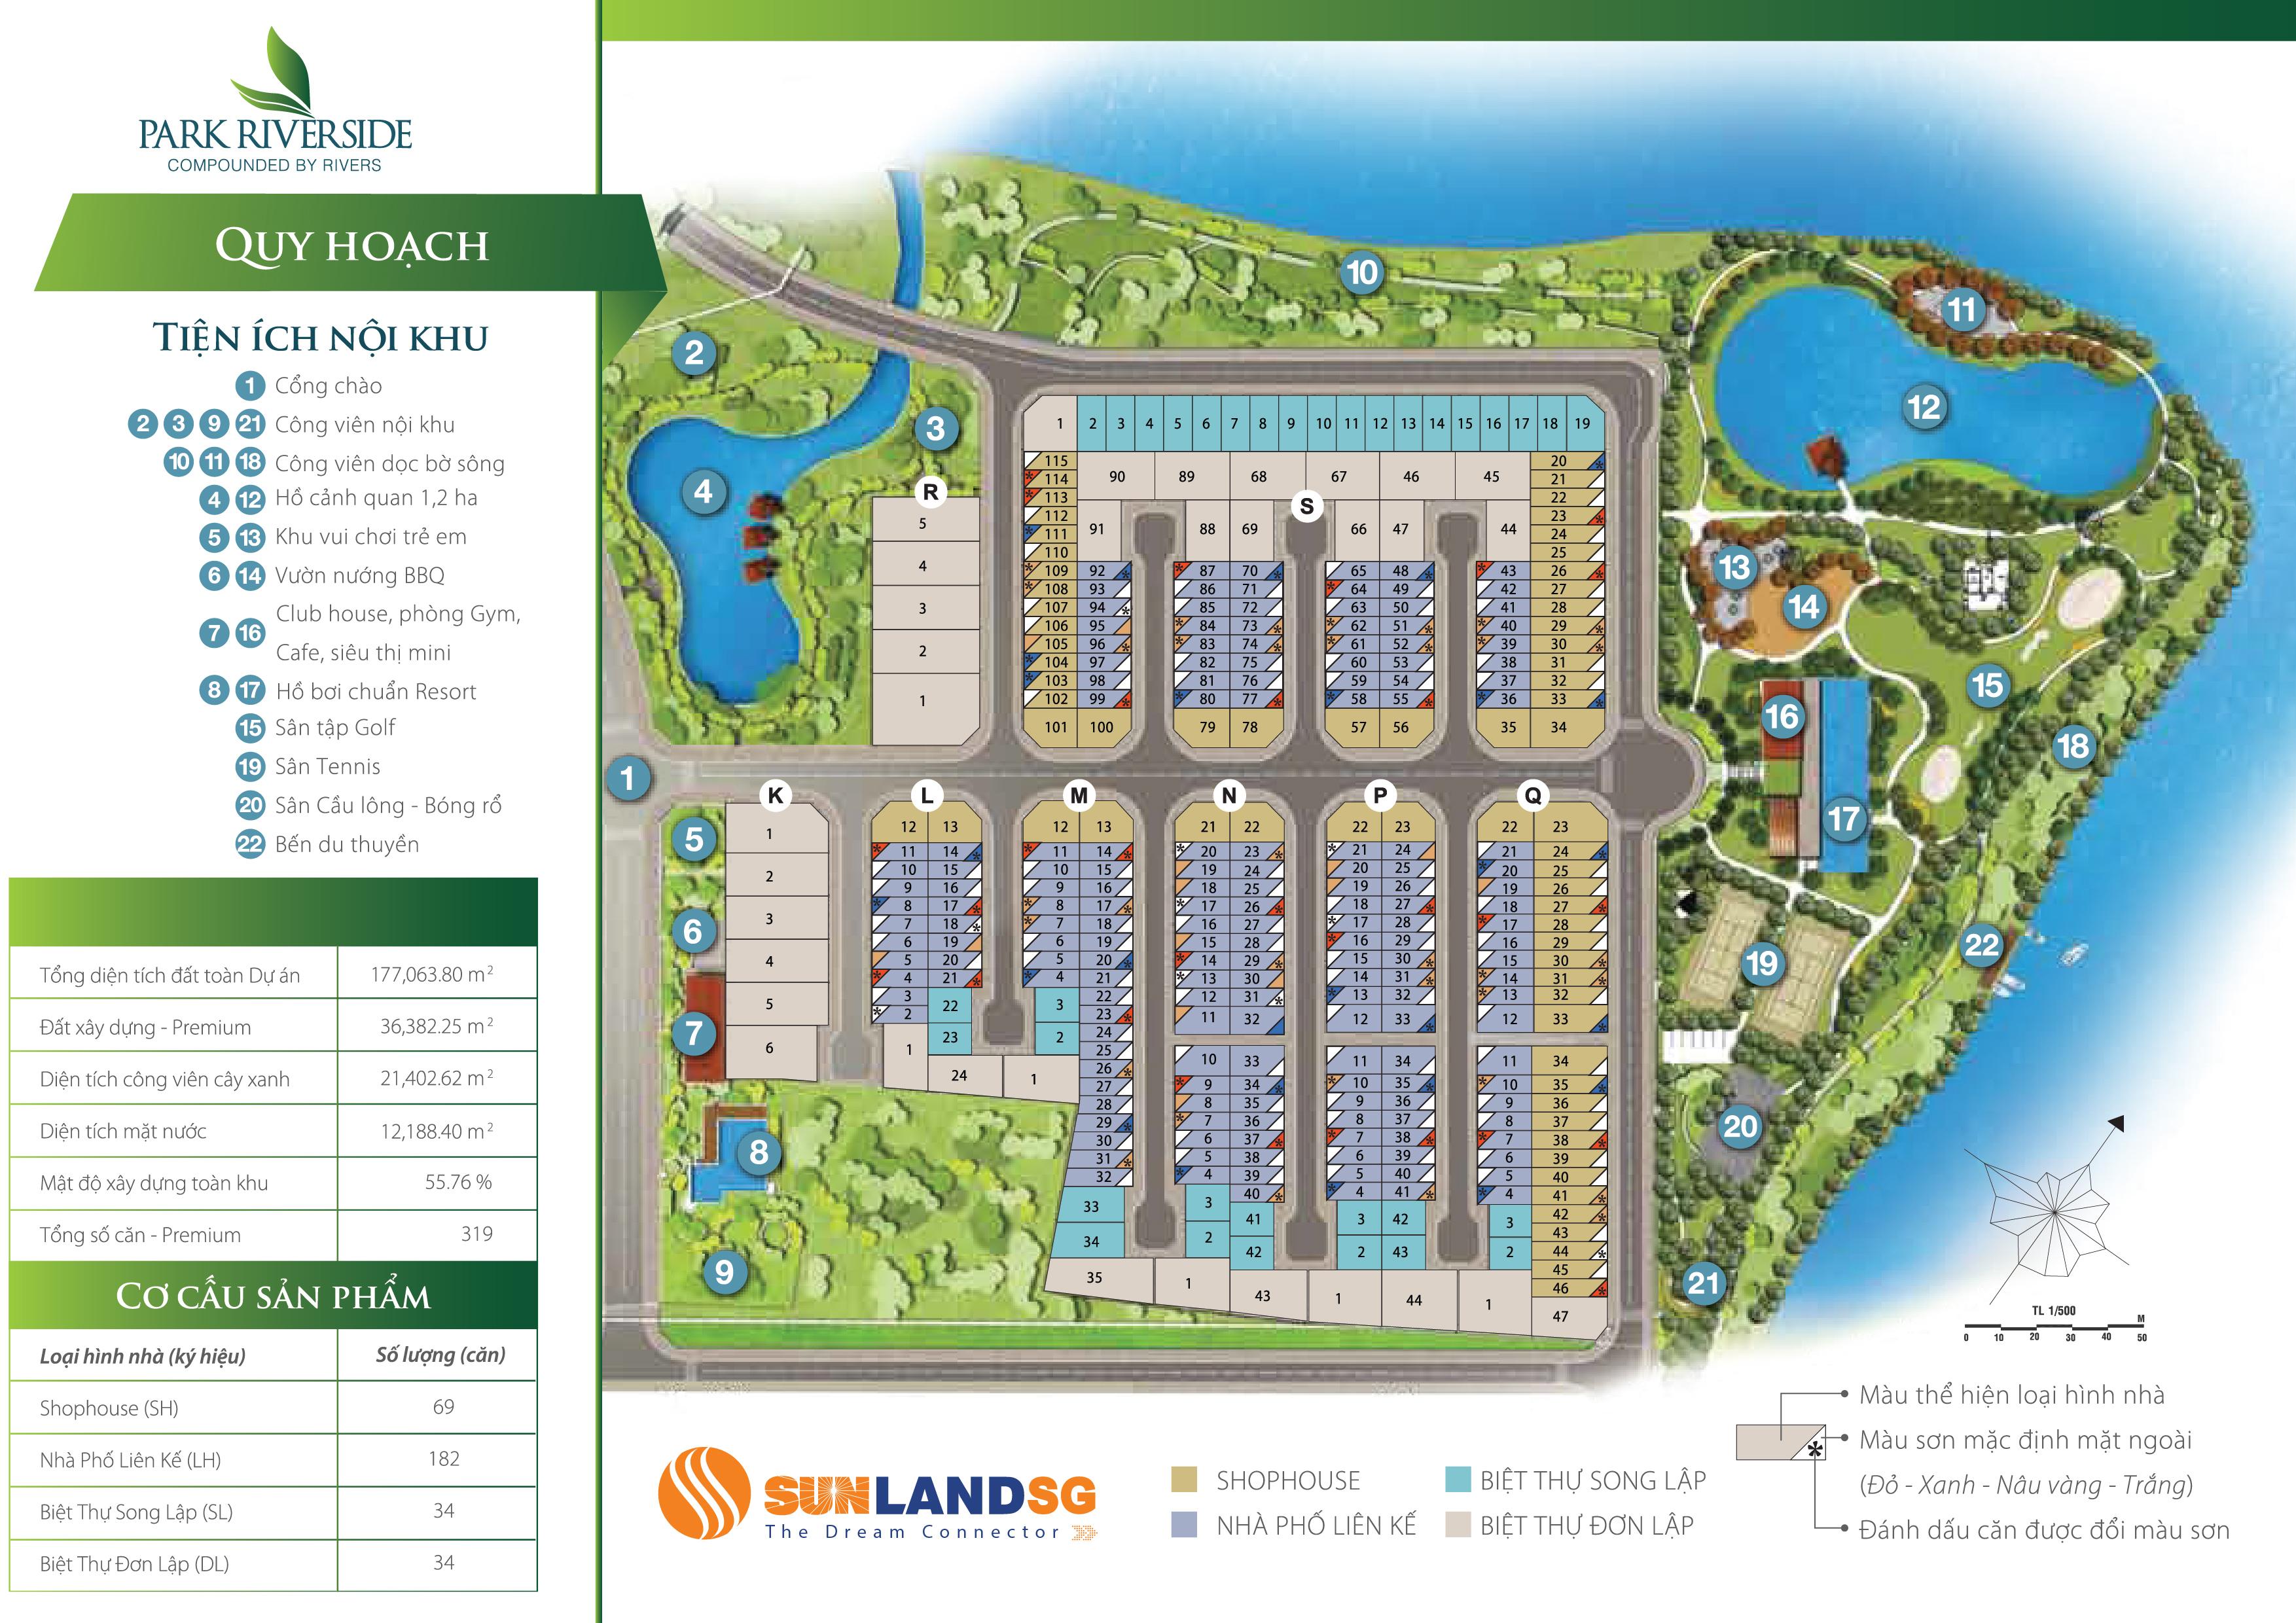 mặt bằng tổng thể Park Riverside Premium